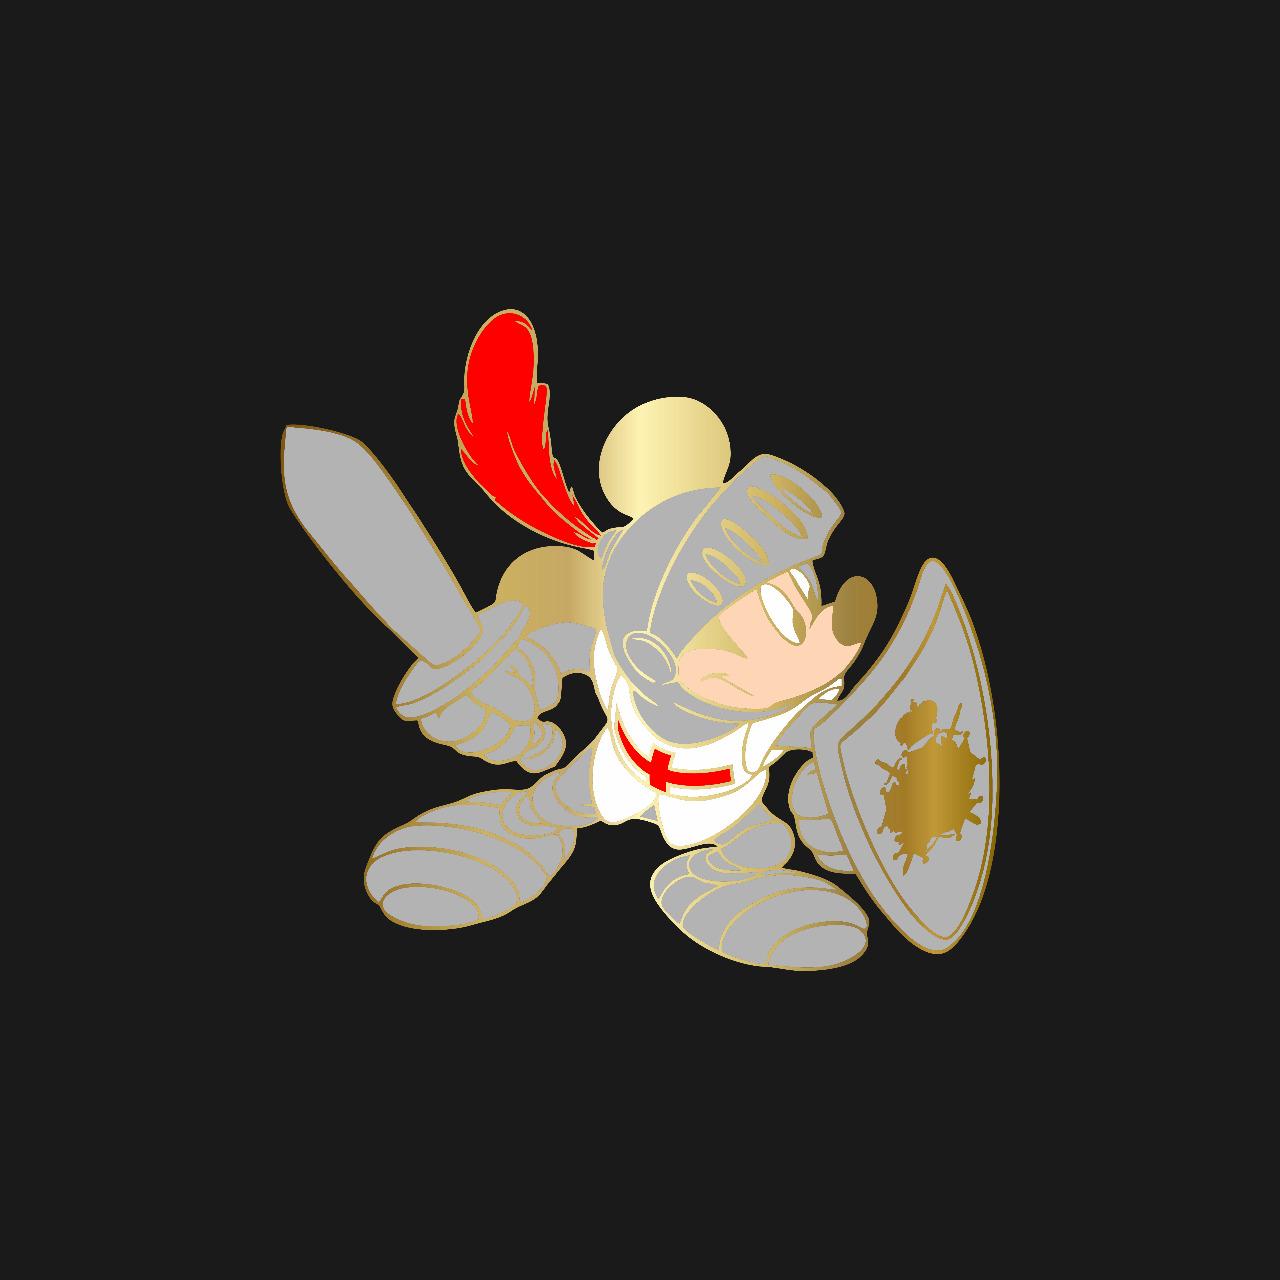 Pré venda PIN DeMolay Colecionador Personagens Mickey Cavaleiro - Envio 15/10 (apenas 100 unidades)